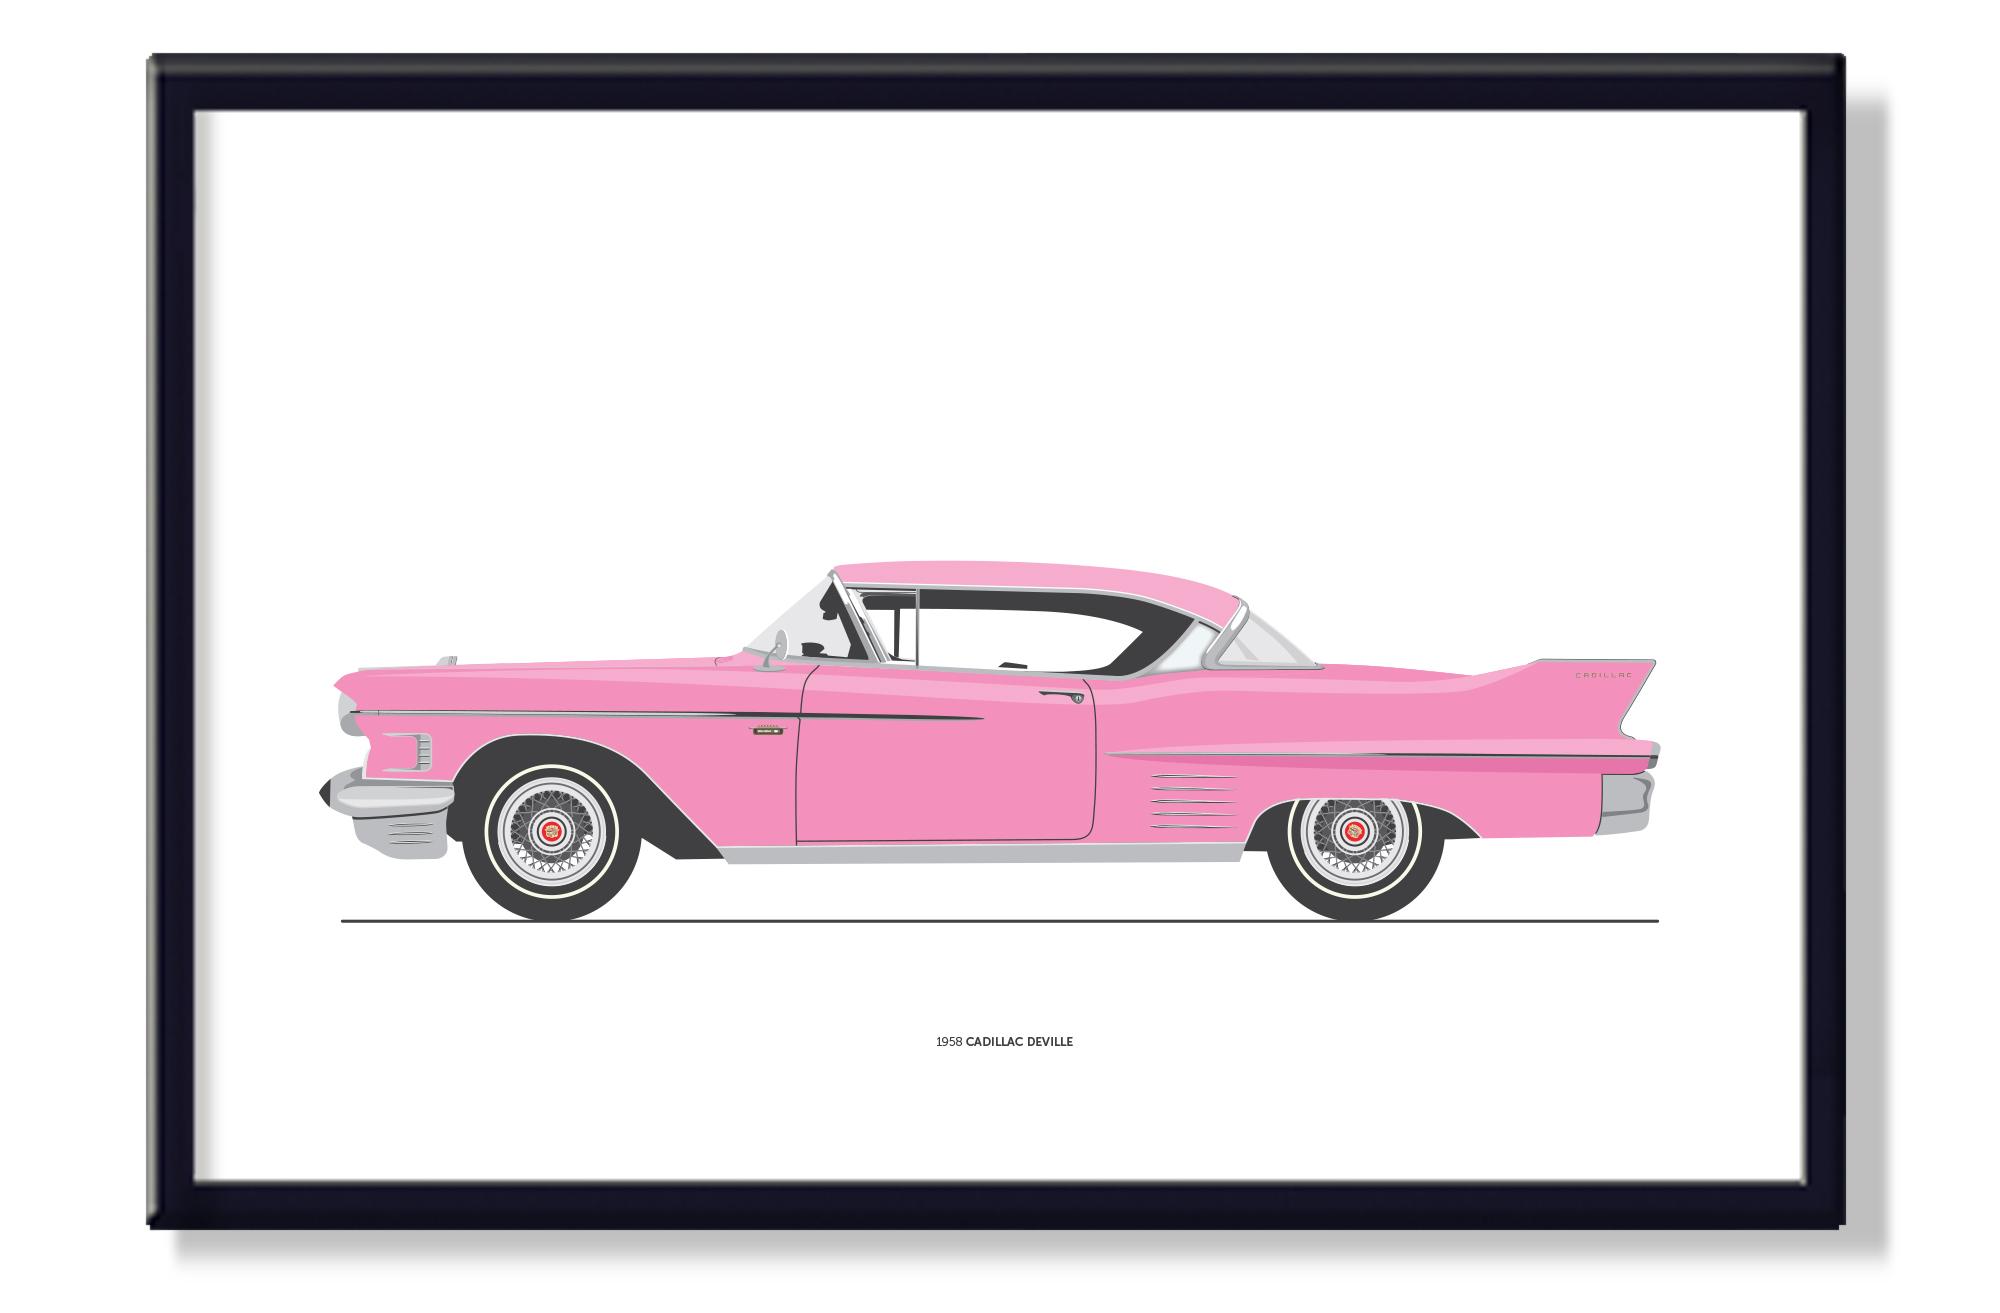 Blog-image-De-Ville-Cadillac